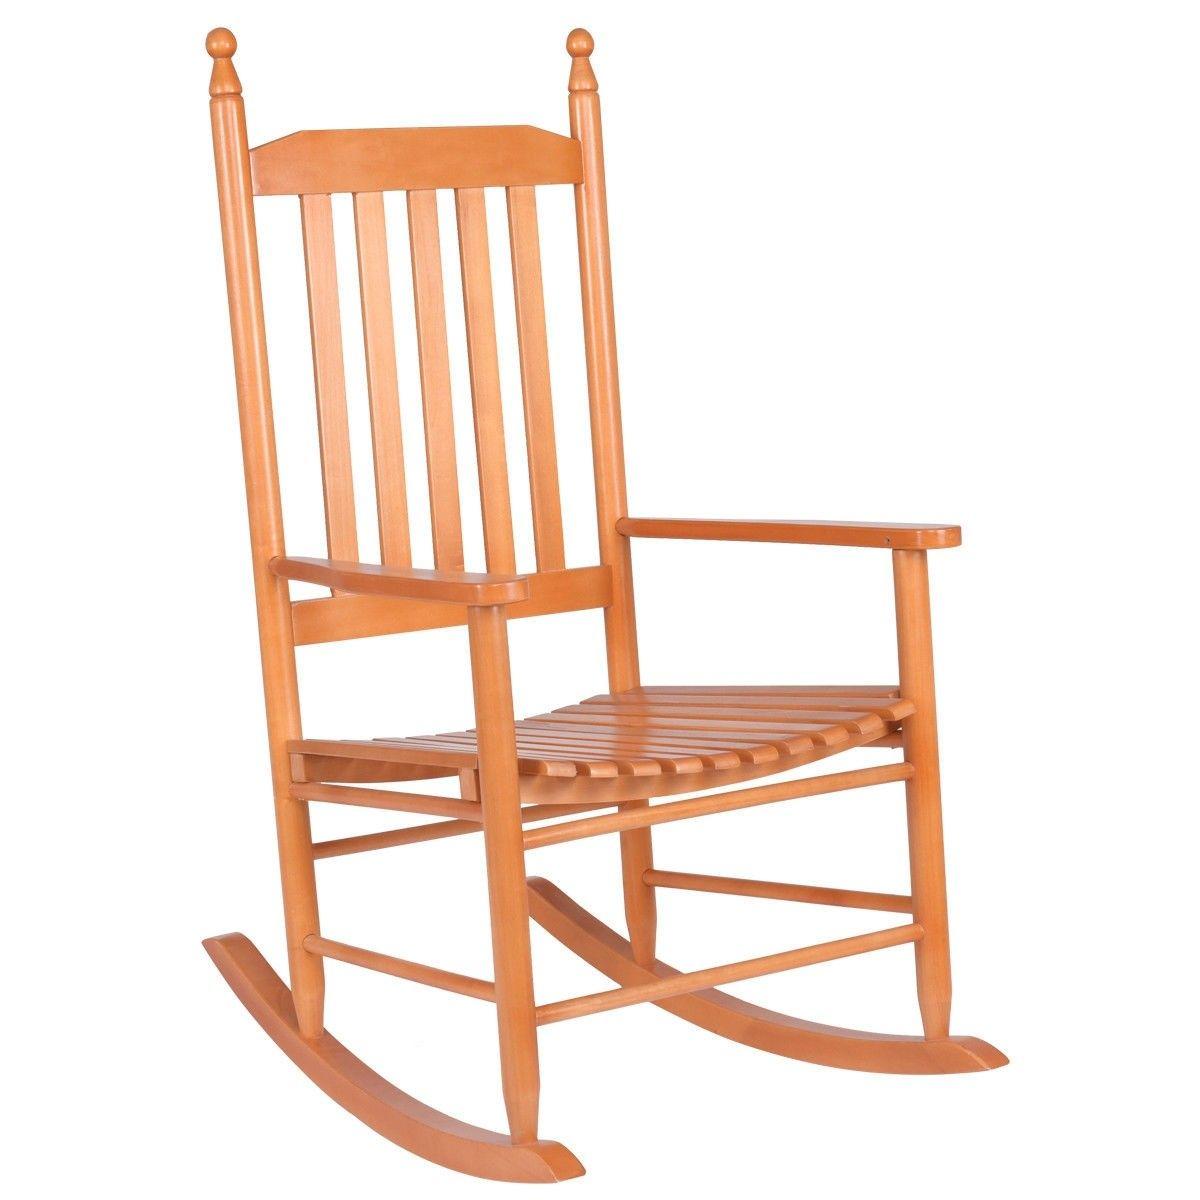 Wooden Balcony Deck Garden Porch Armchair Rocking Chair Rocking Chair Outdoor Rocking Chairs Wooden Rocking Chairs